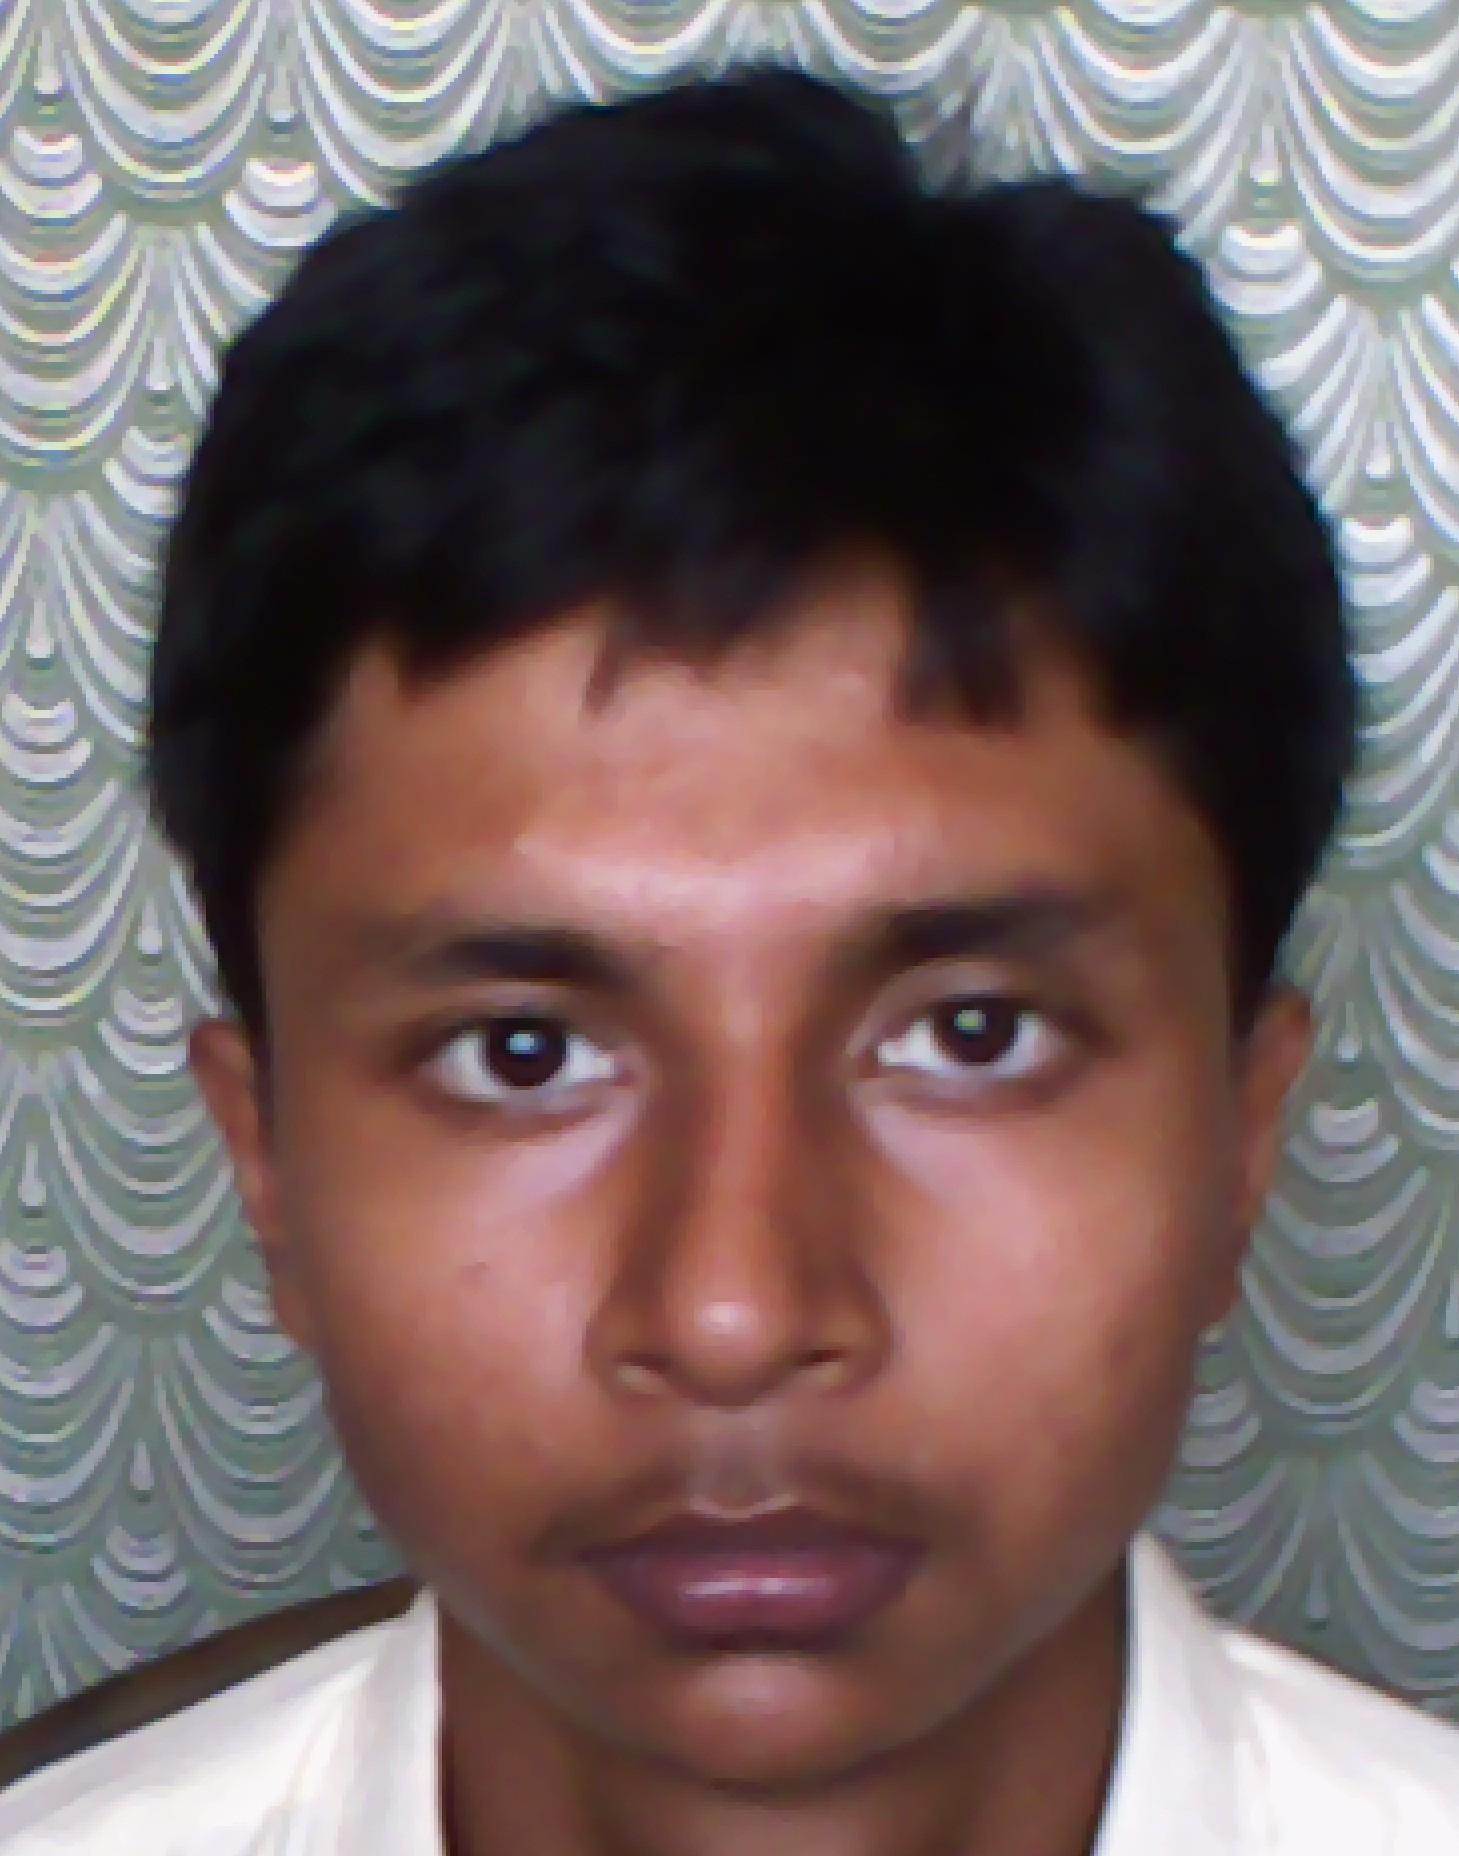 BIDHAN CHANDRA MONDAL